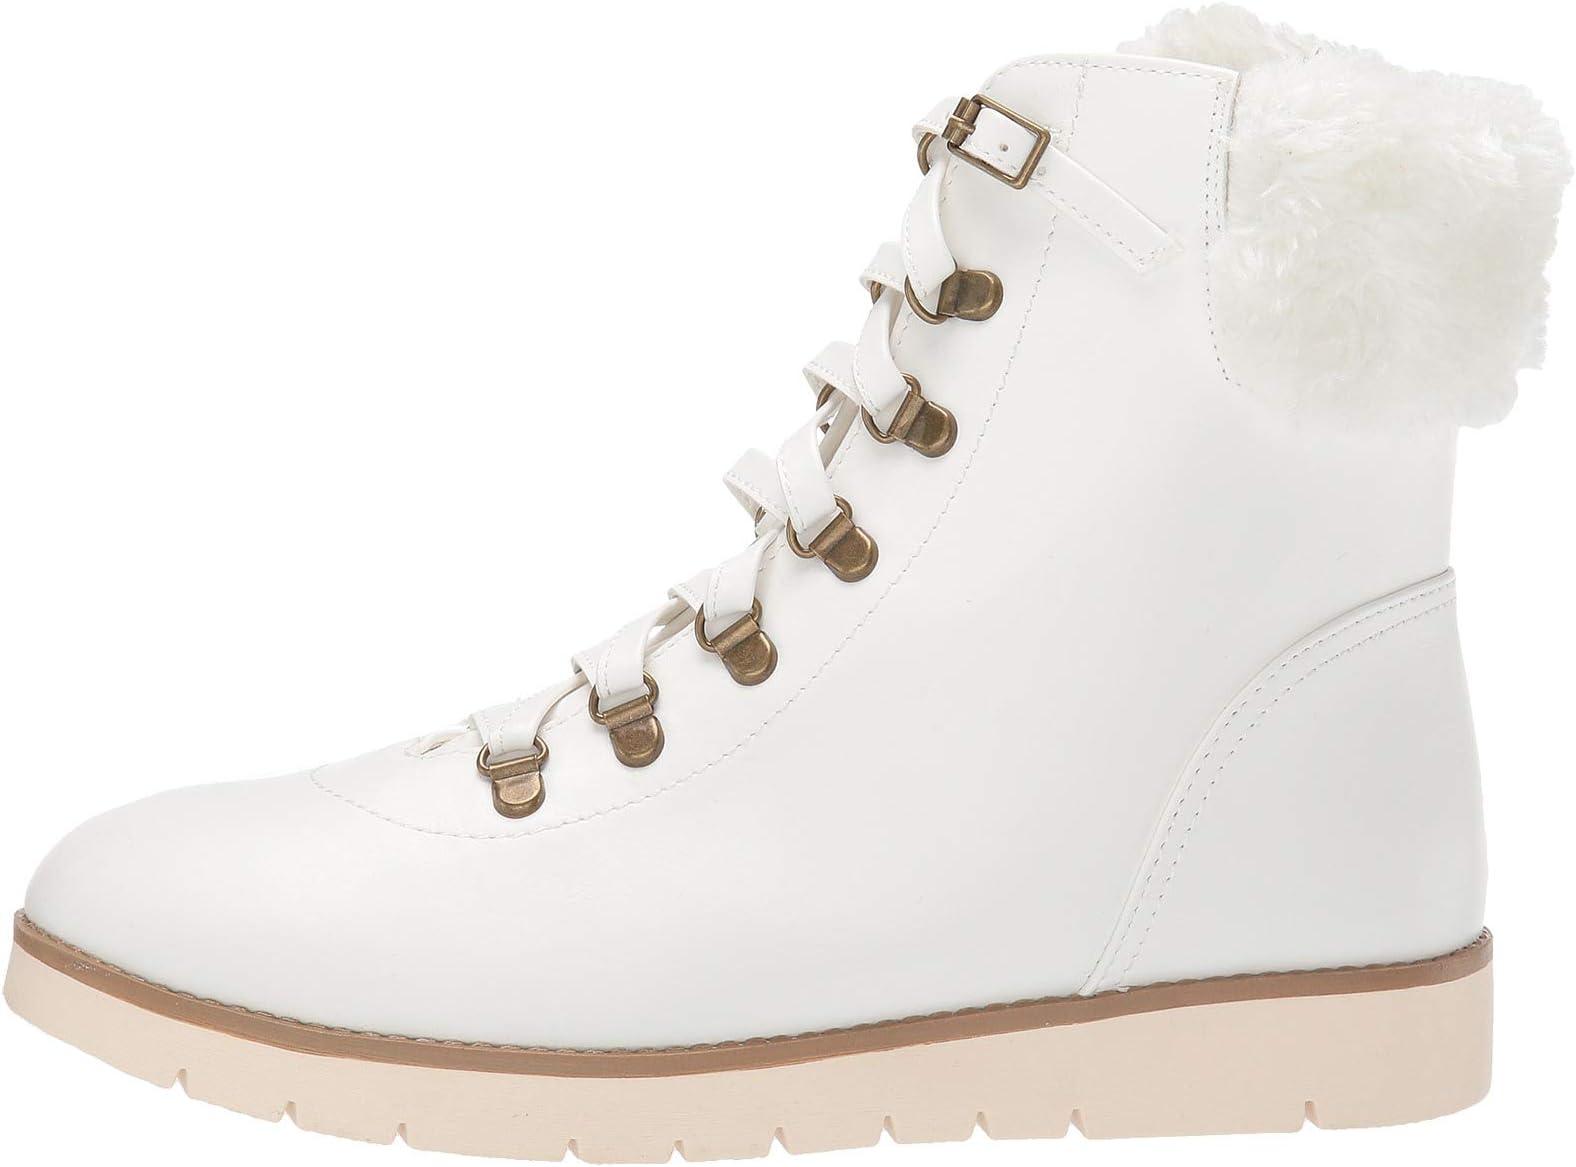 MIA Mikayla | Women's shoes | 2020 Newest